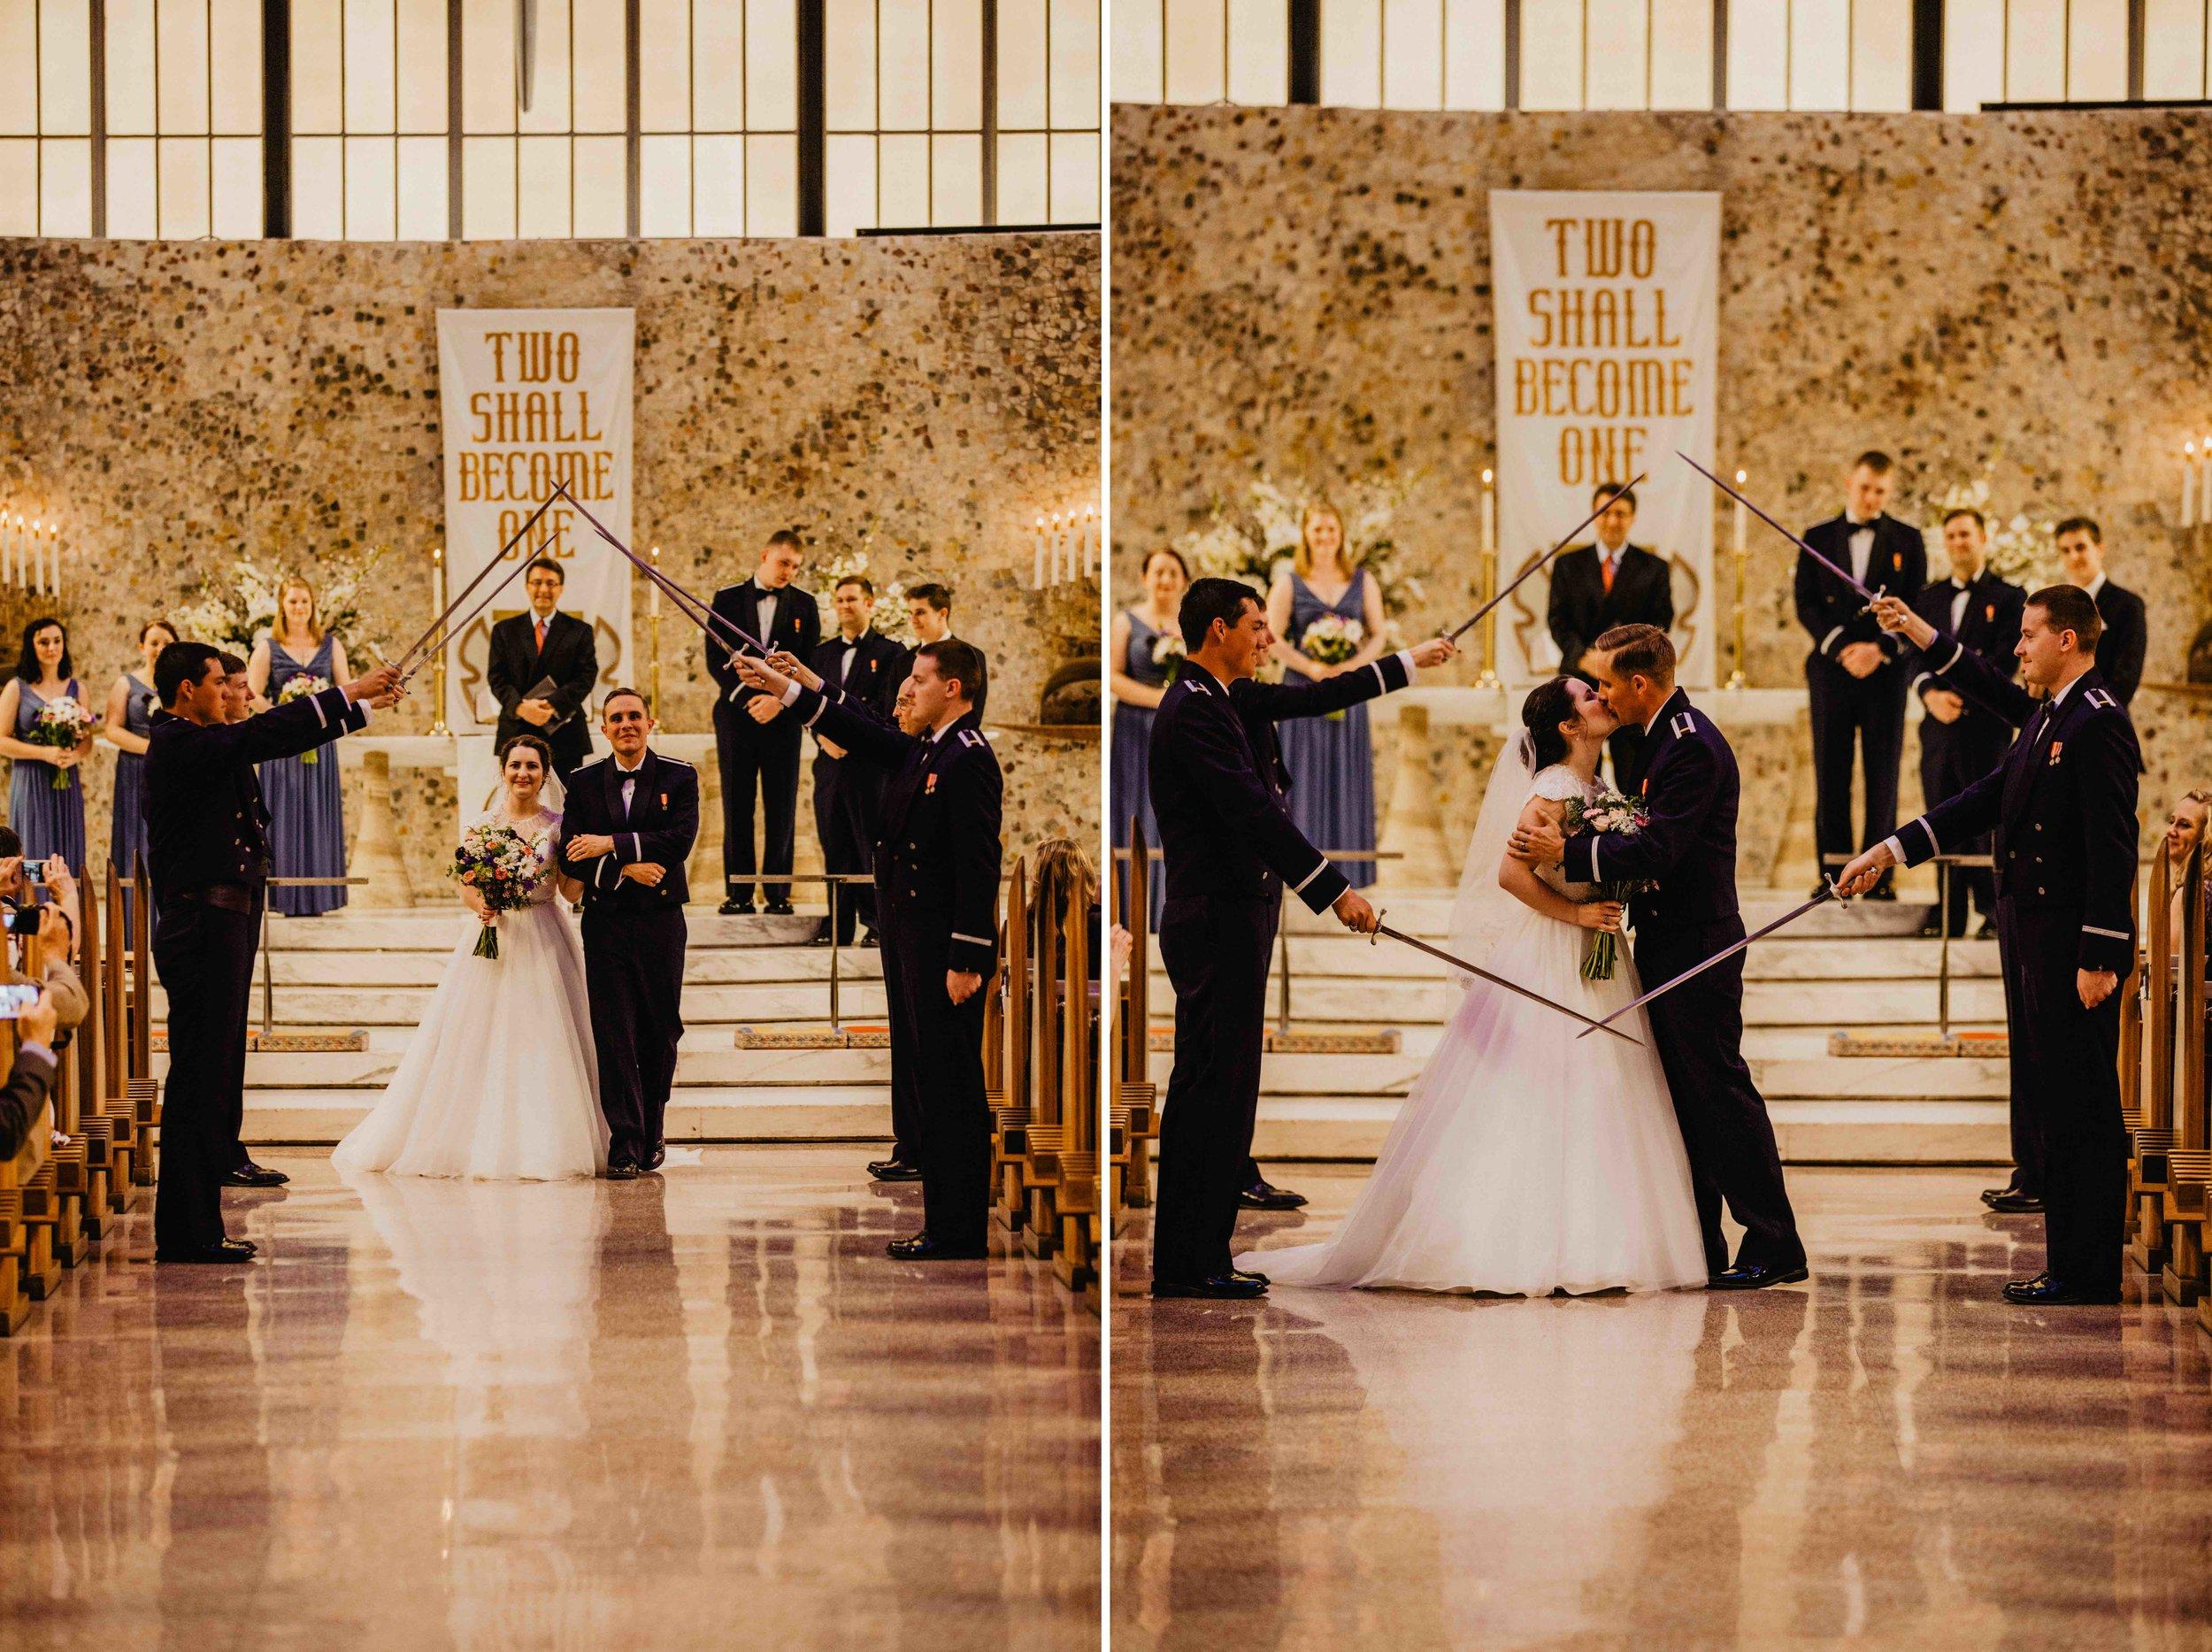 607A5612-colorado-wedding-photographer-denver-springs-vail--colorado-wedding-photographer-denver-springs-vail-.jpeg